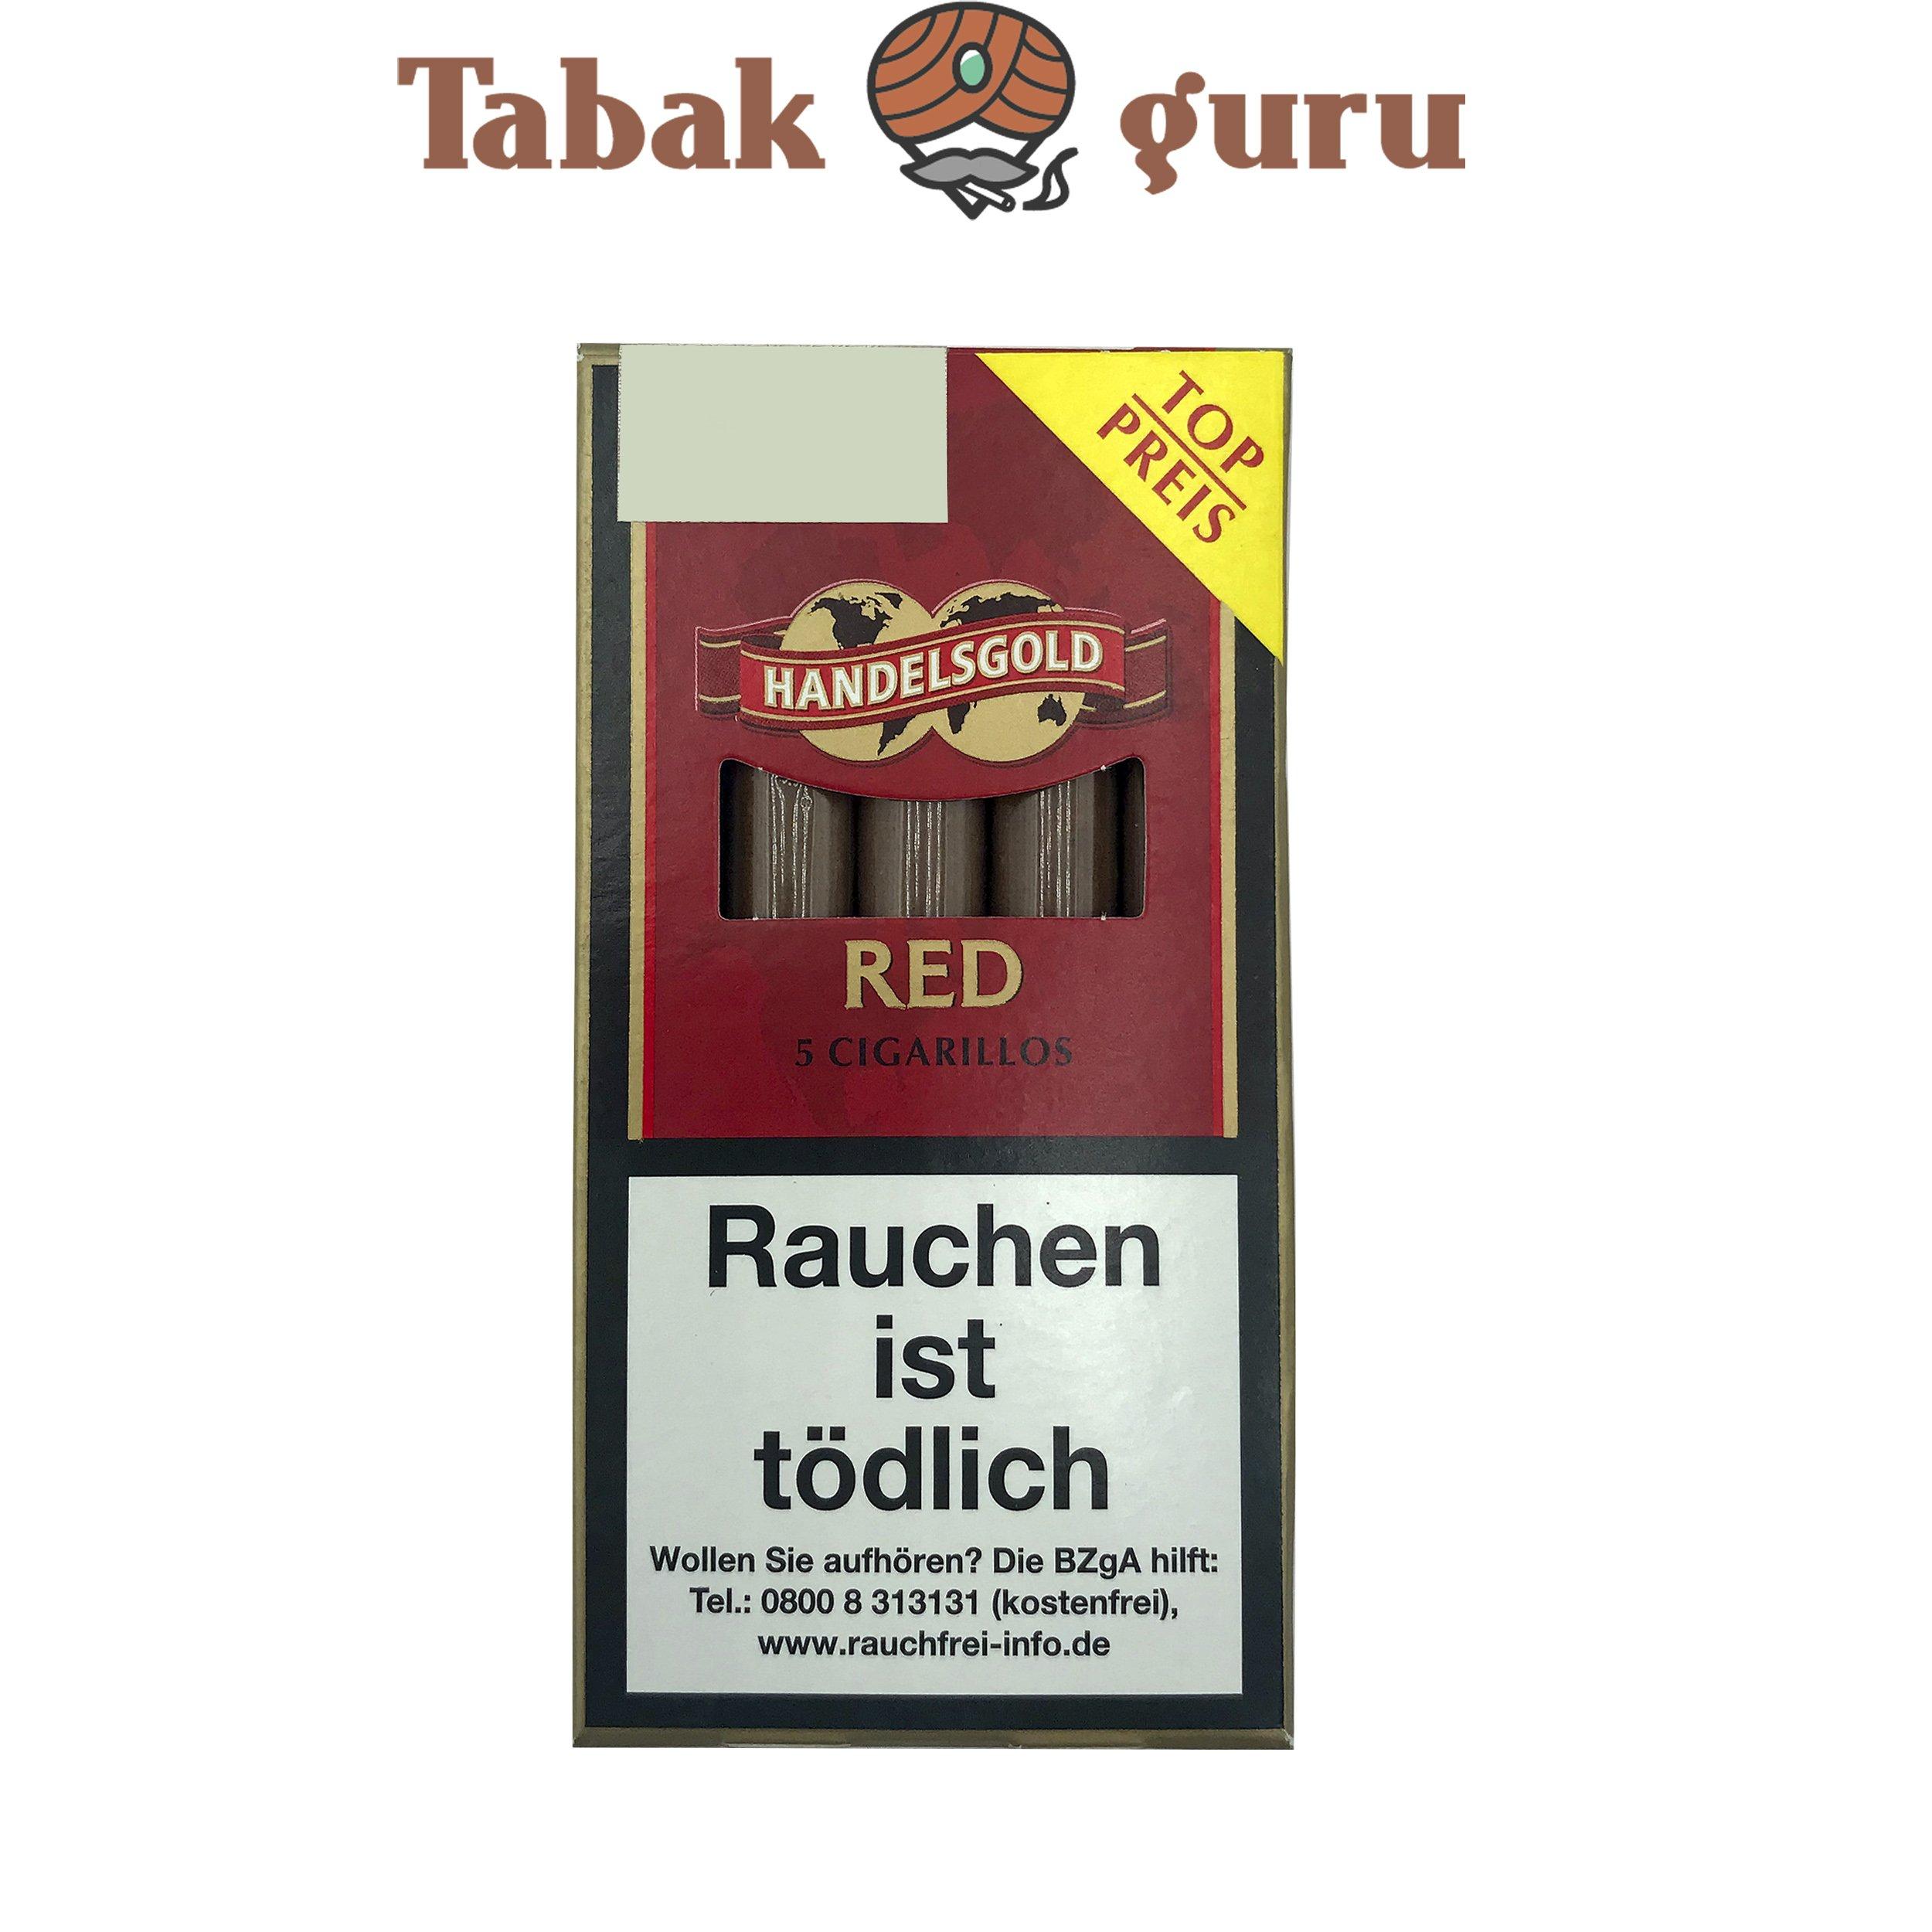 Handelsgold Red No. 213 Filterzigarillos a 5 Stück